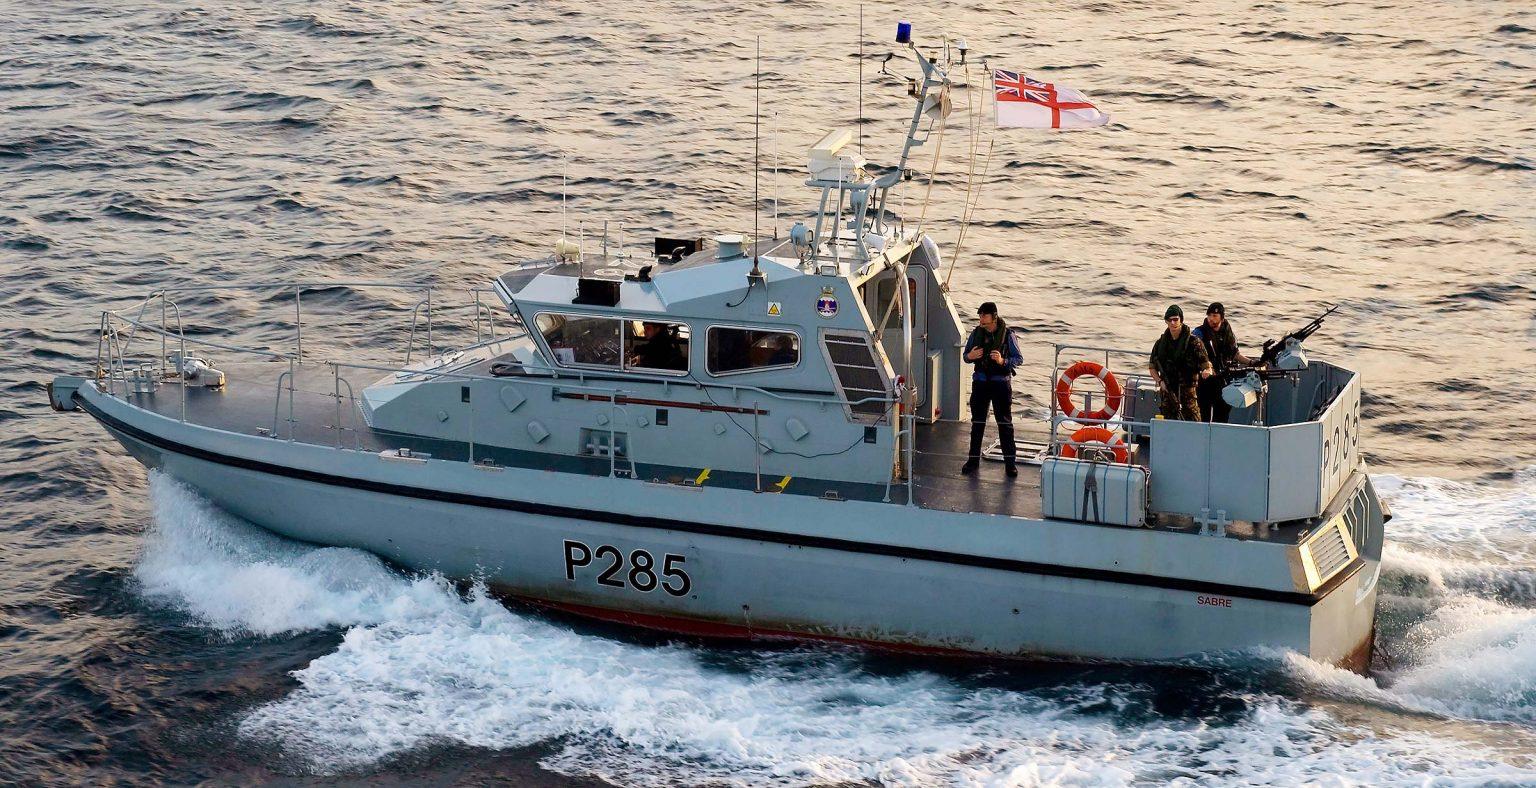 HMS-Sabre-Spanish-Incursion-1536x798.jpg